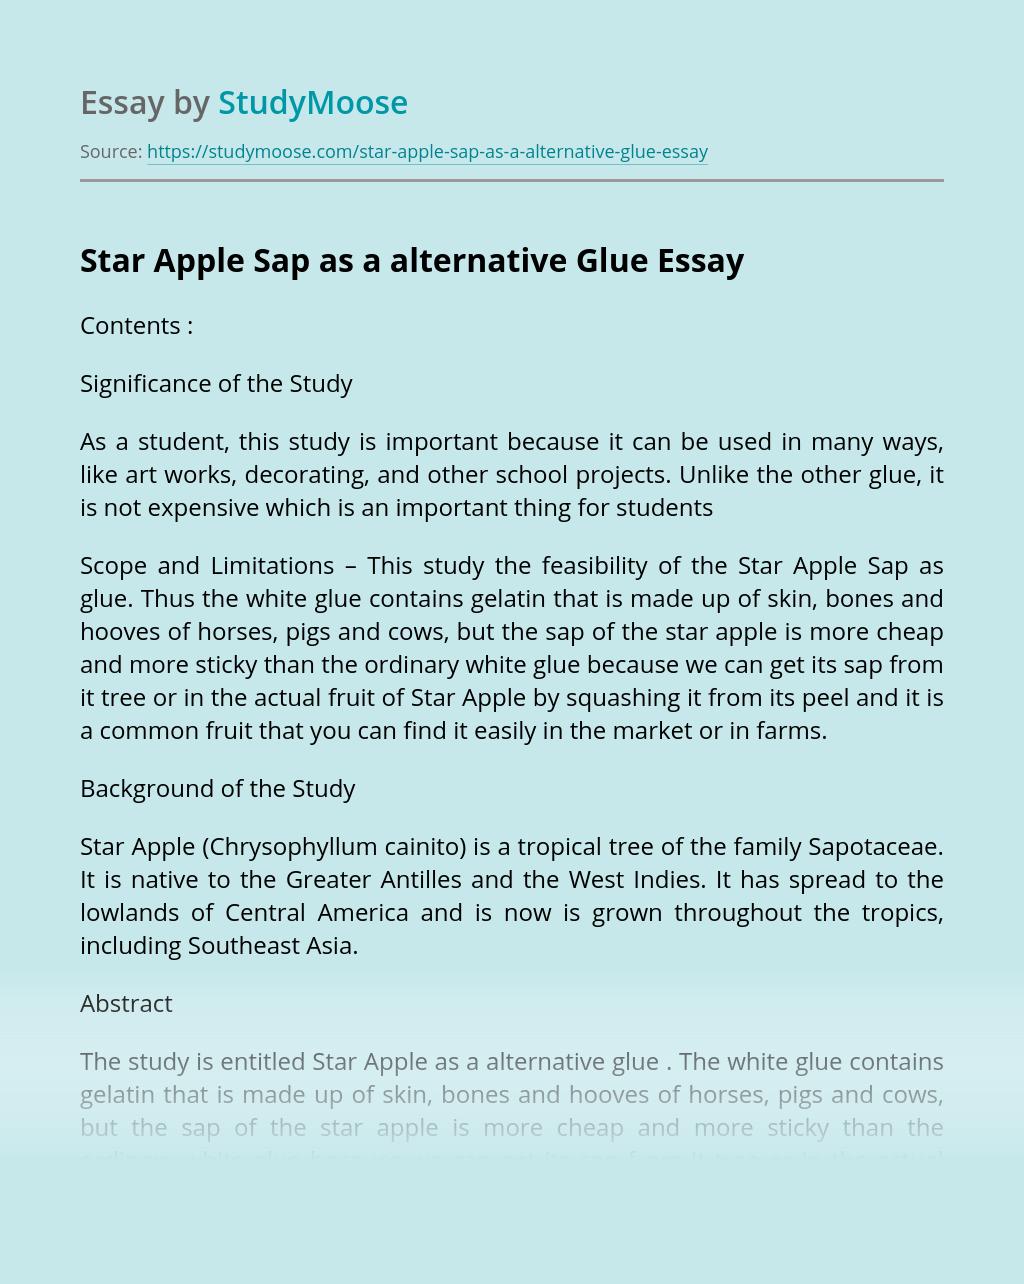 Star Apple Sap as a alternative Glue